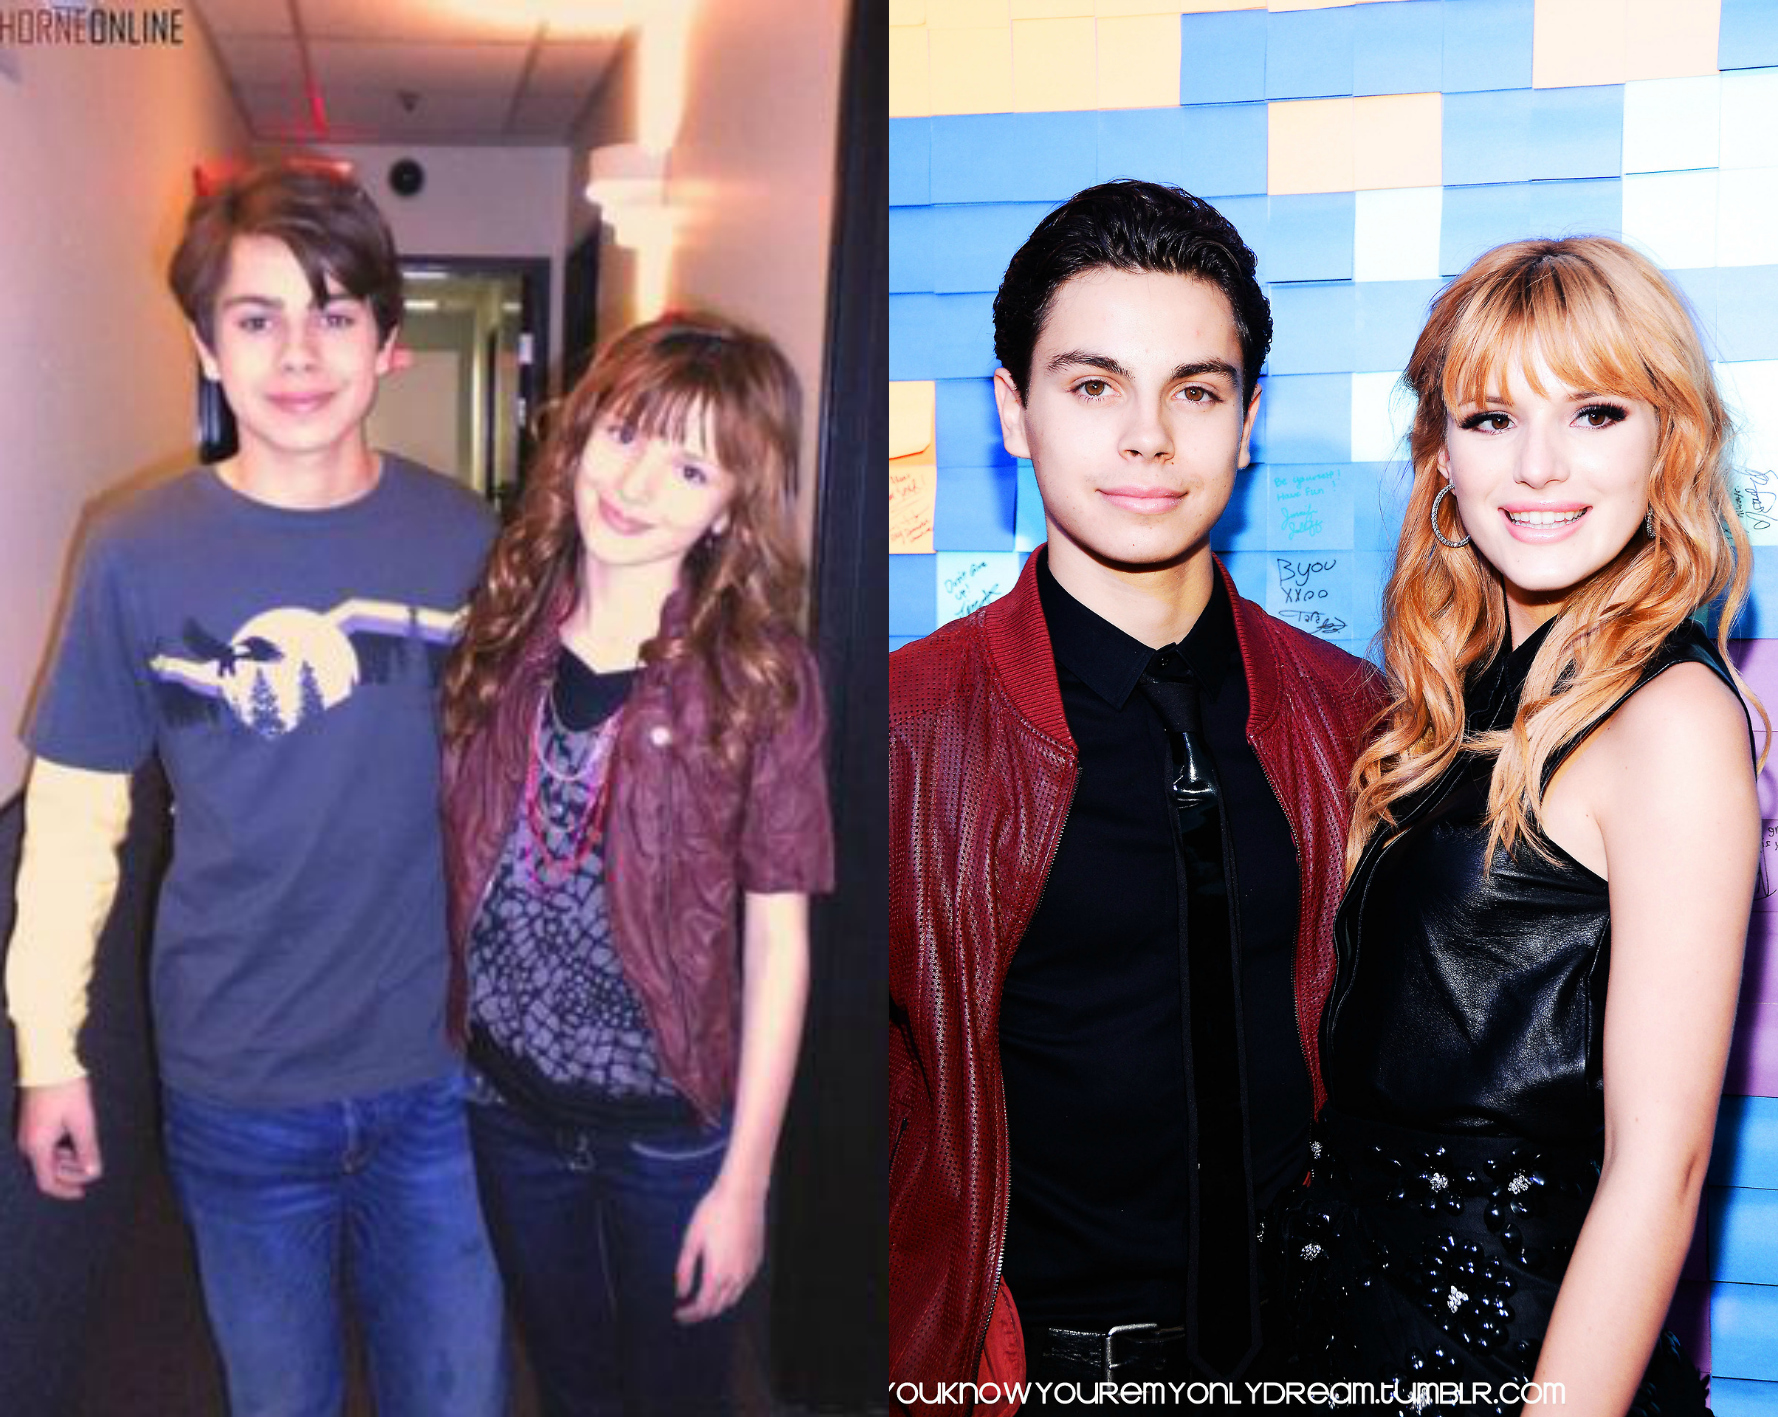 Image - Bella-Thorne-and-JakeTAustin-Pic-ComparisonYears ... Jake T Austin And Bella Thorne Kissing